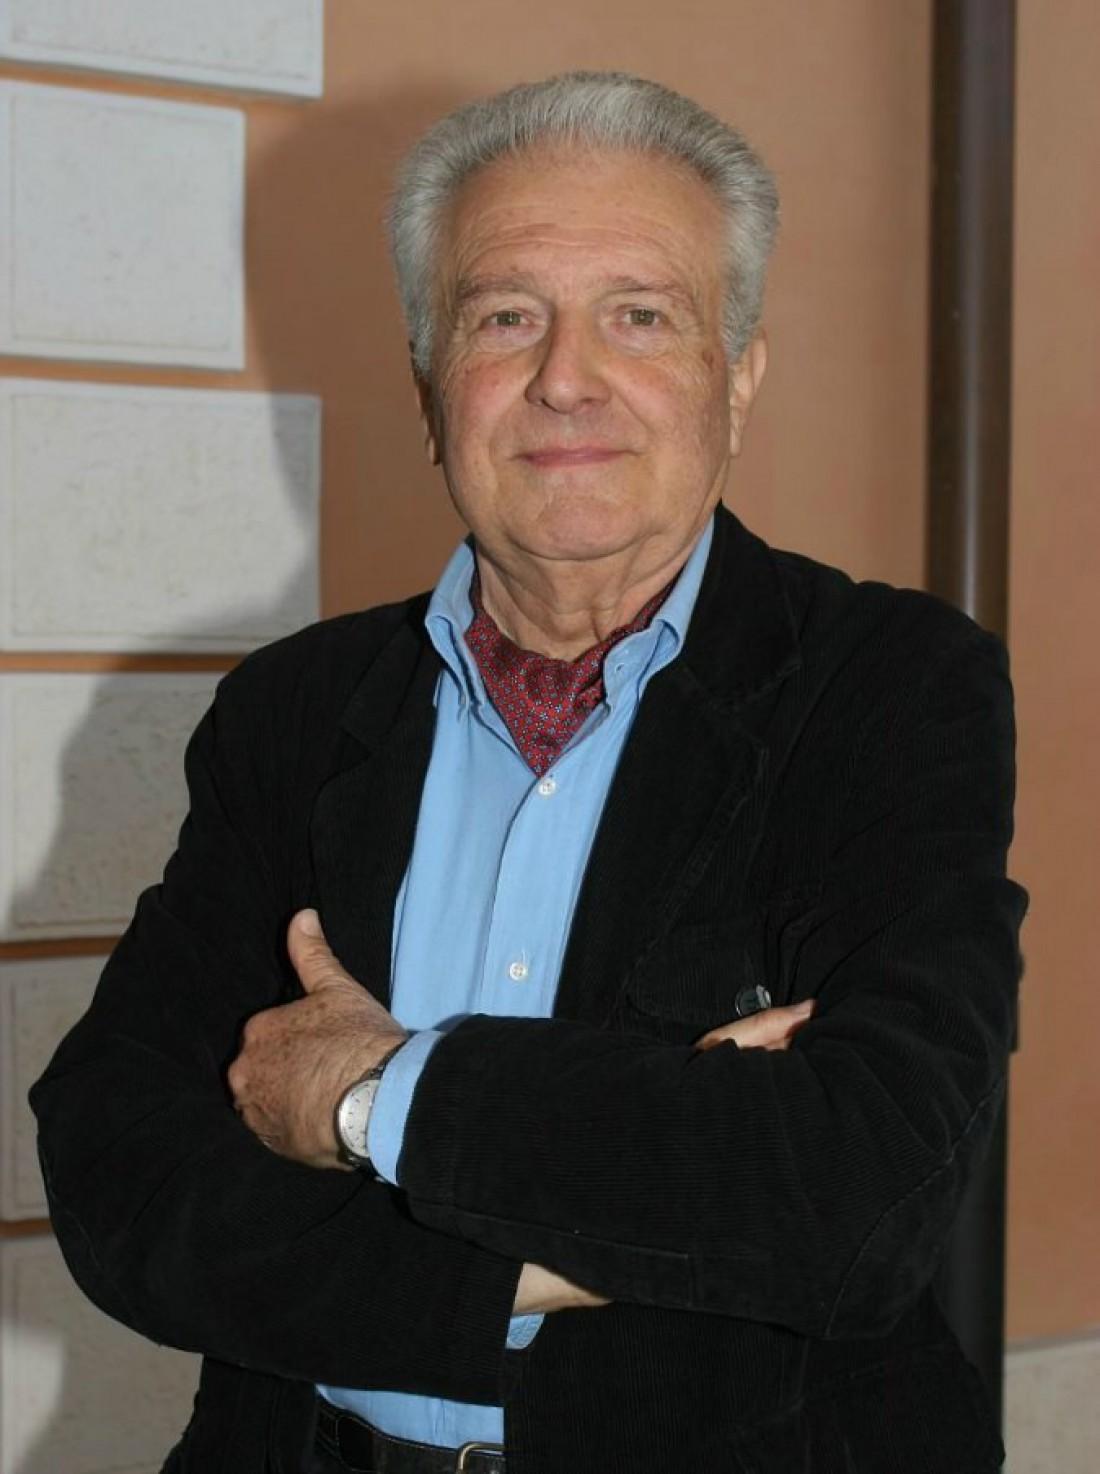 Режиссер Джузеппе Феррара не дожил до 84-х